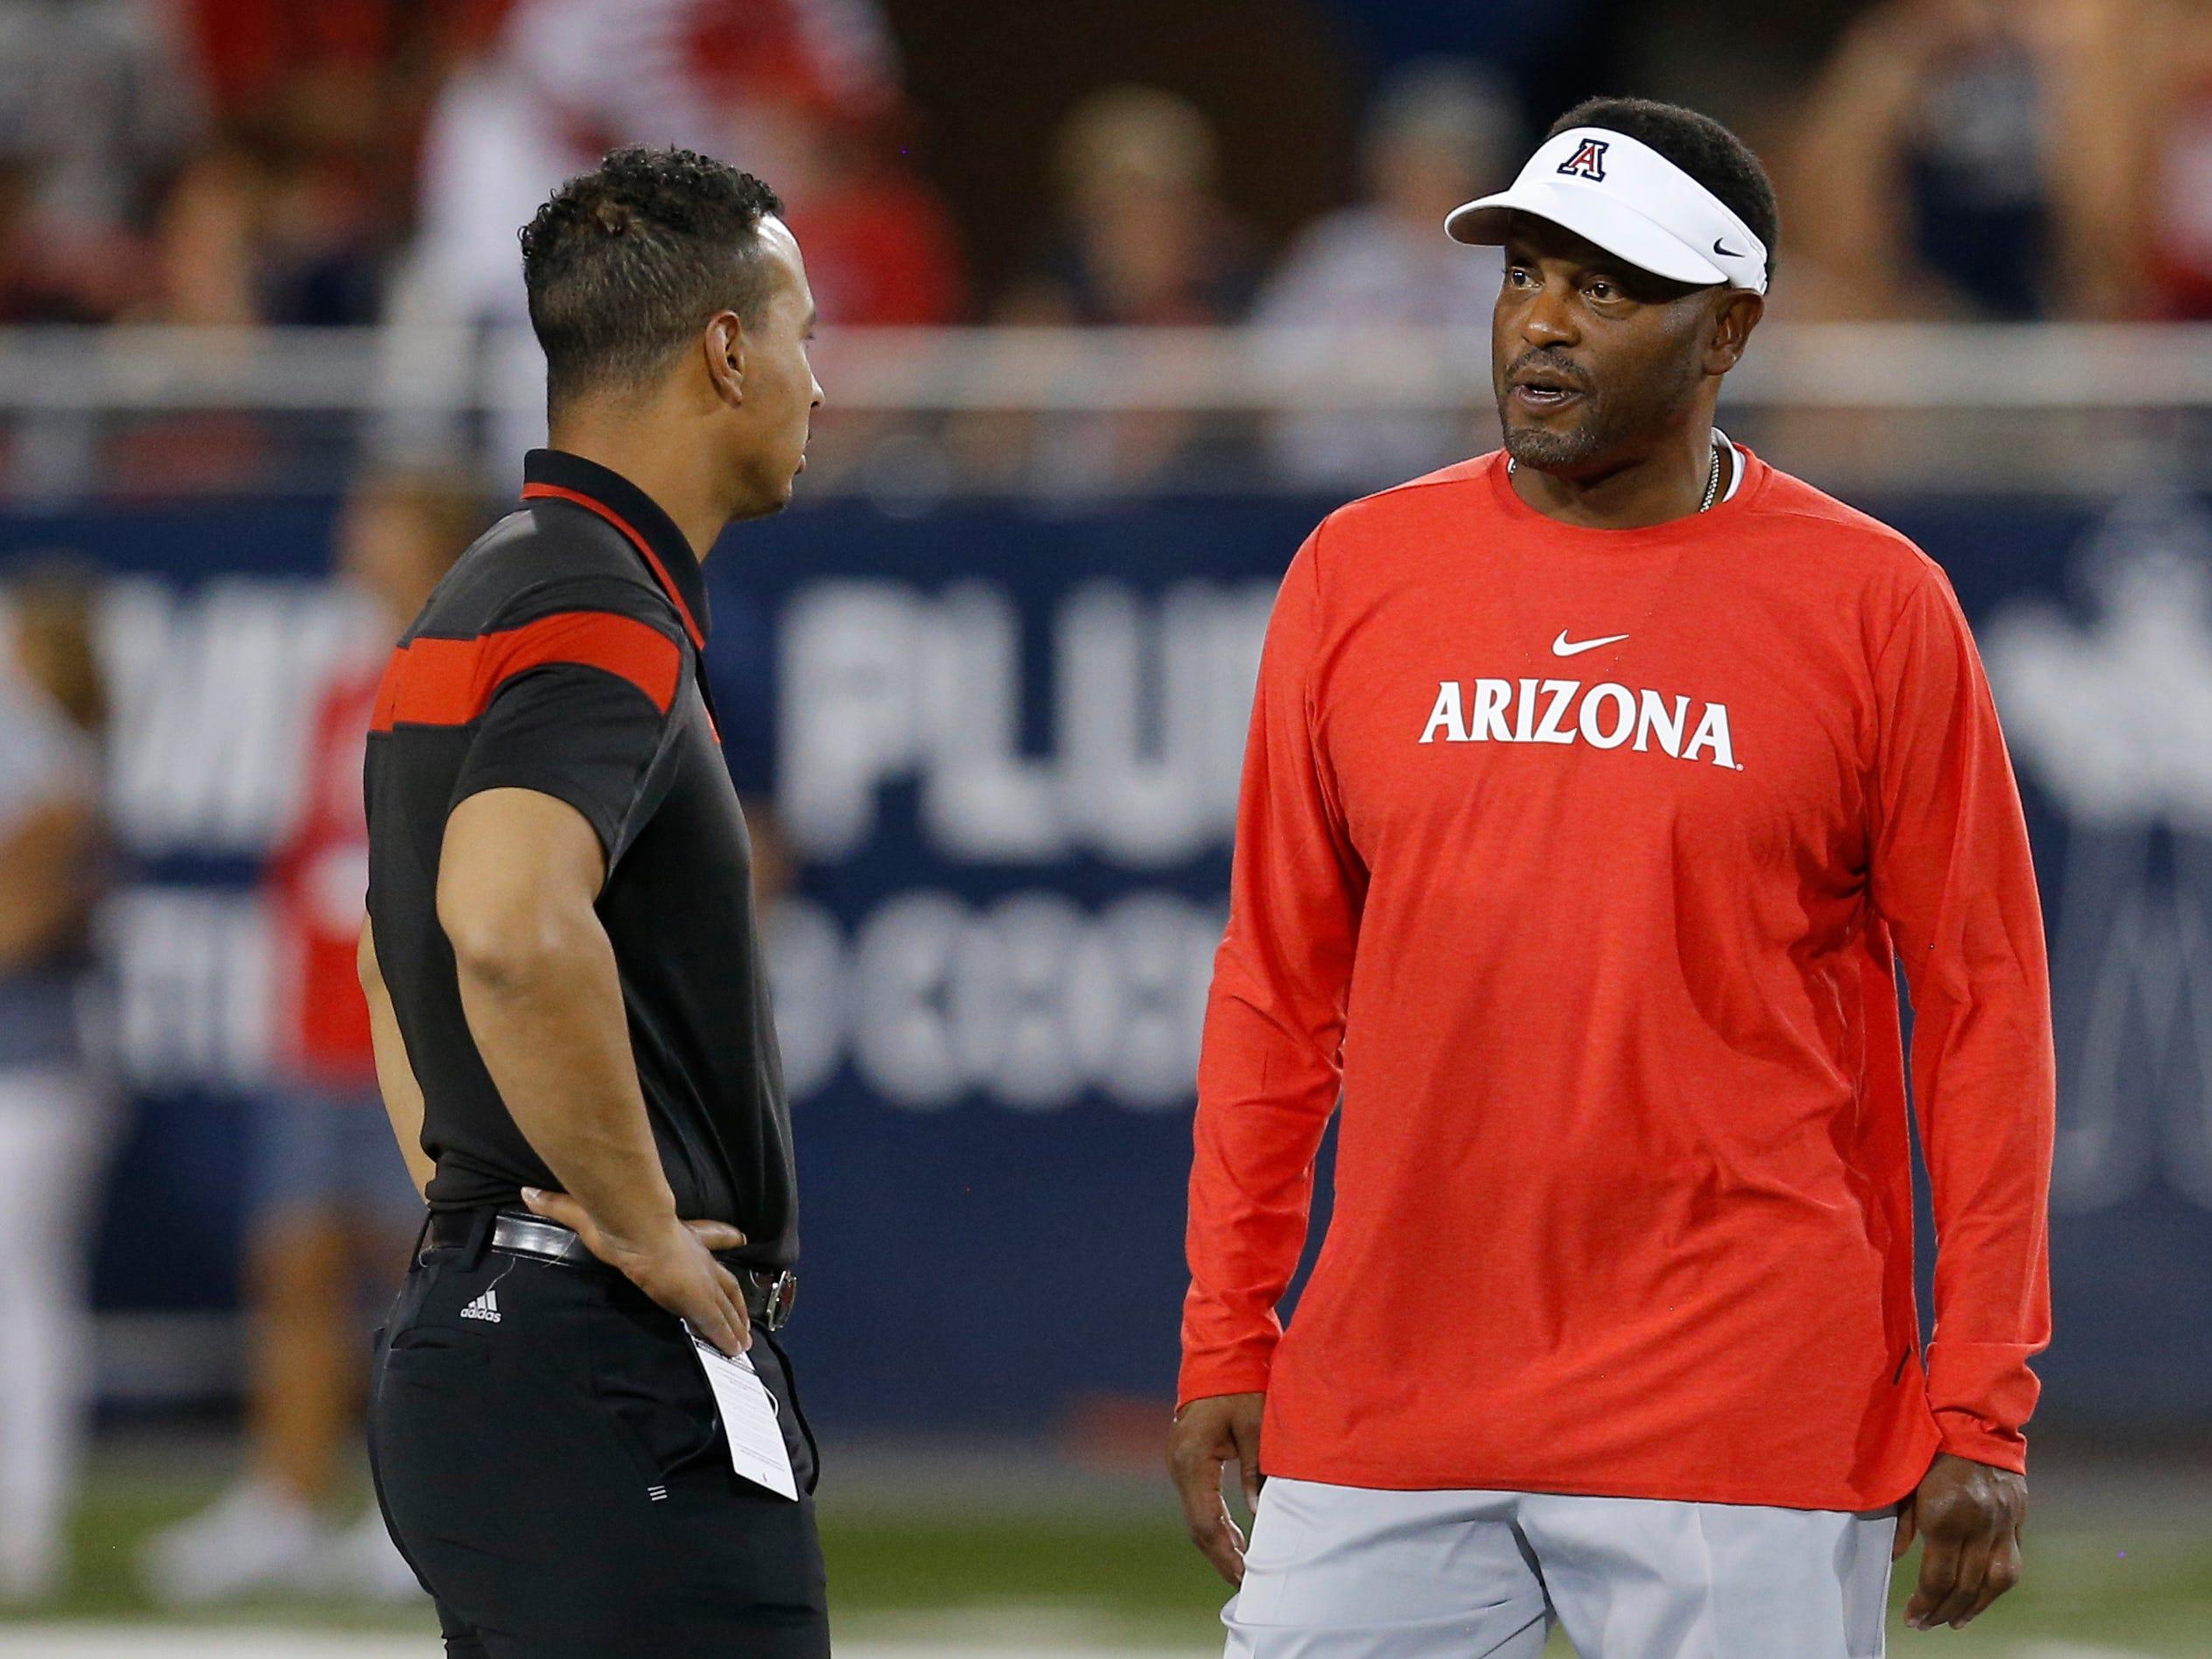 Southern Utah head coach Demario Warren and Arizona head coach Kevin Sumlin talk before an NCAA college football game, Saturday, Sept. 15, 2018, in Tucson, Ariz. (AP Photo/Rick Scuteri)